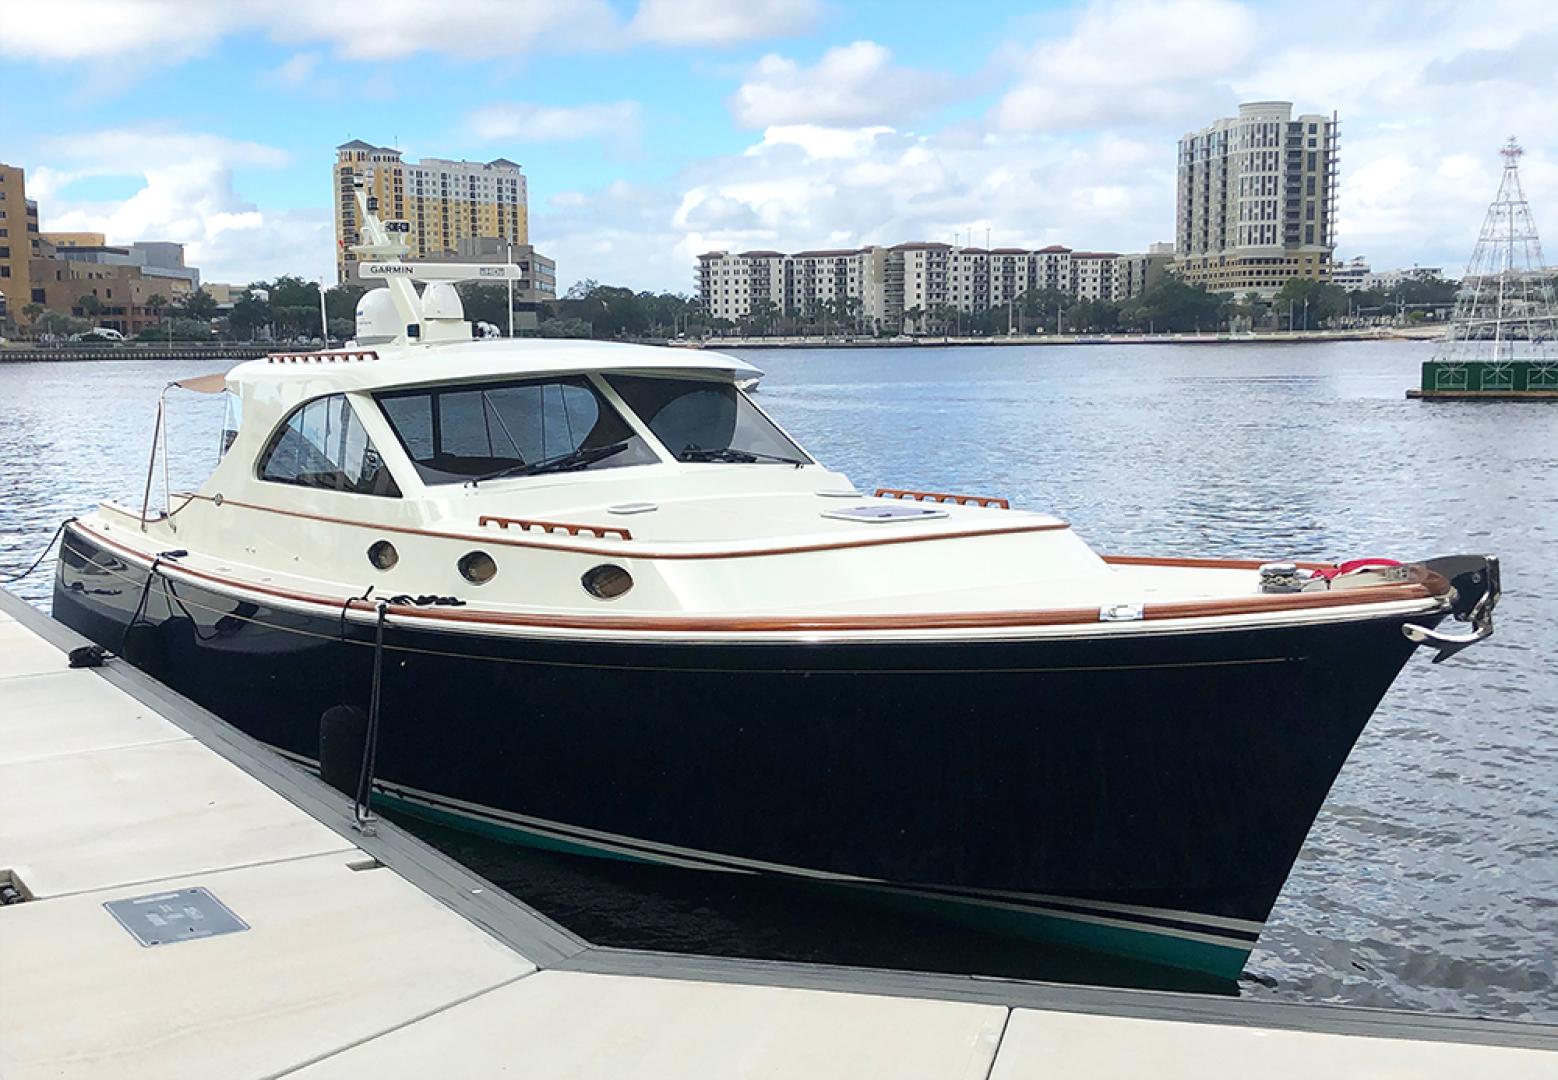 San Juan-SJ48 Express 2006 FEARLESS Saint Petersburg-Florida-United States-Stbd bow profile-1501484 | Thumbnail